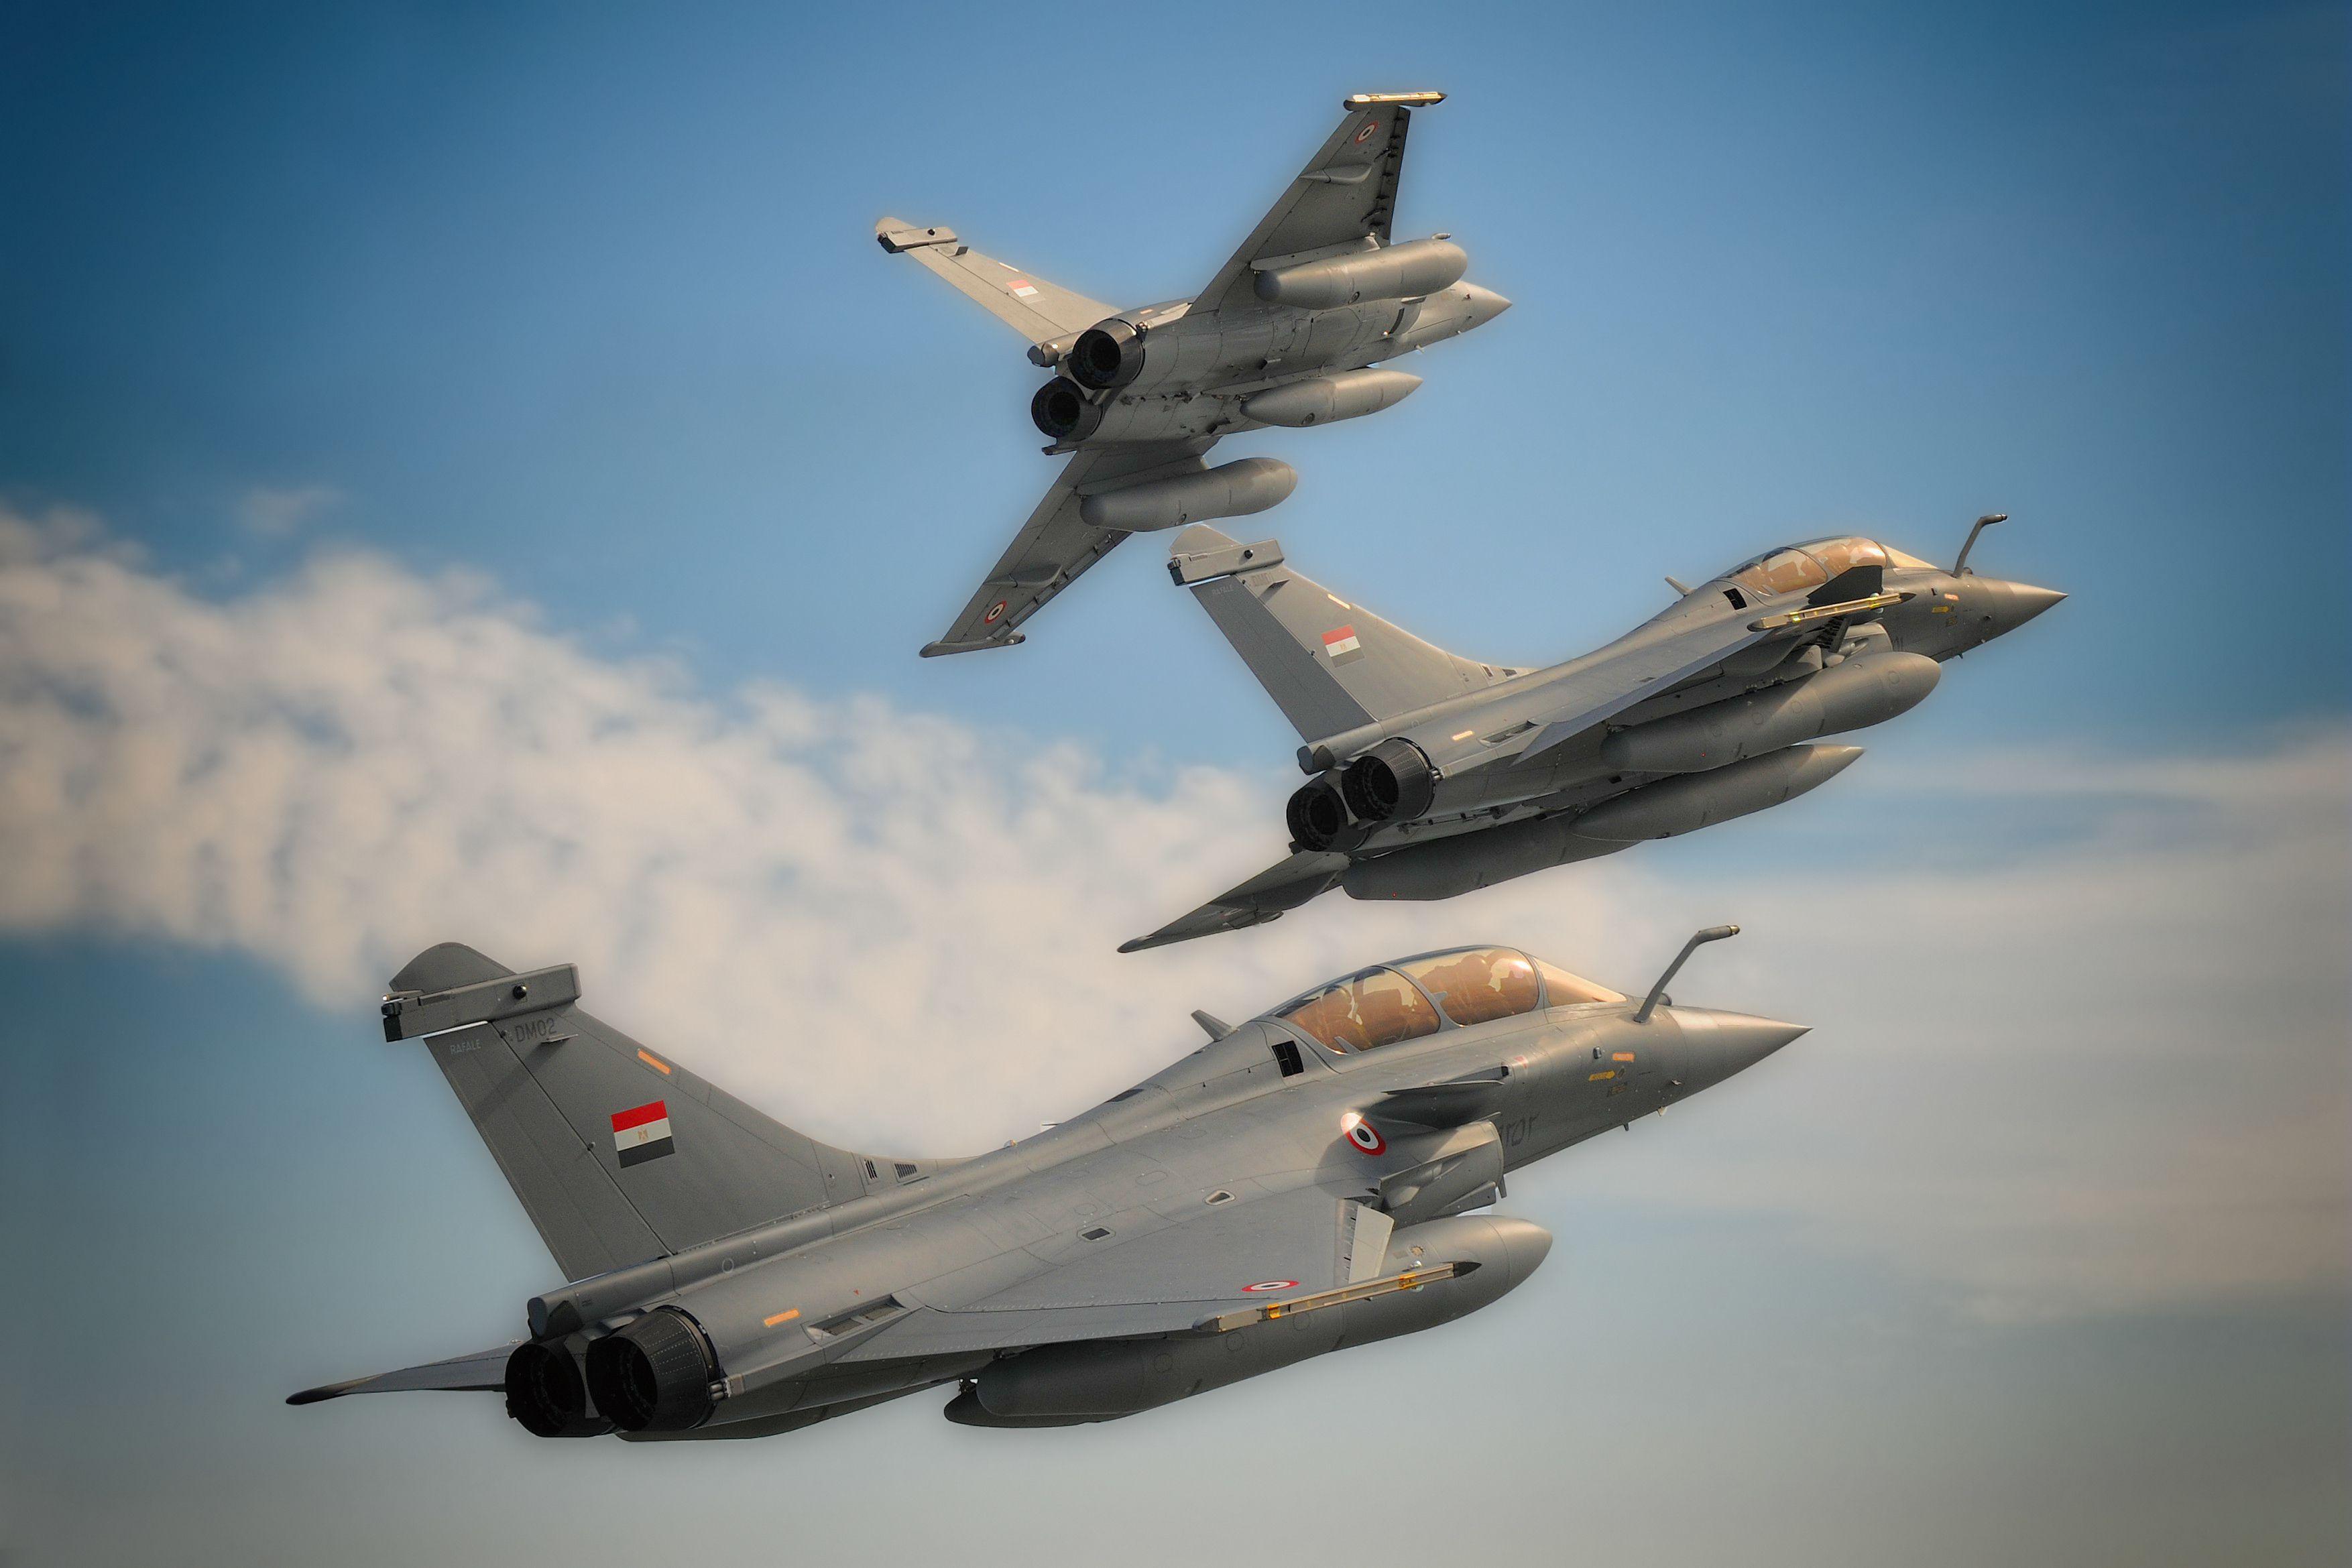 Egyptian Dassault Rafale EM [3508x2339] Fighter jets